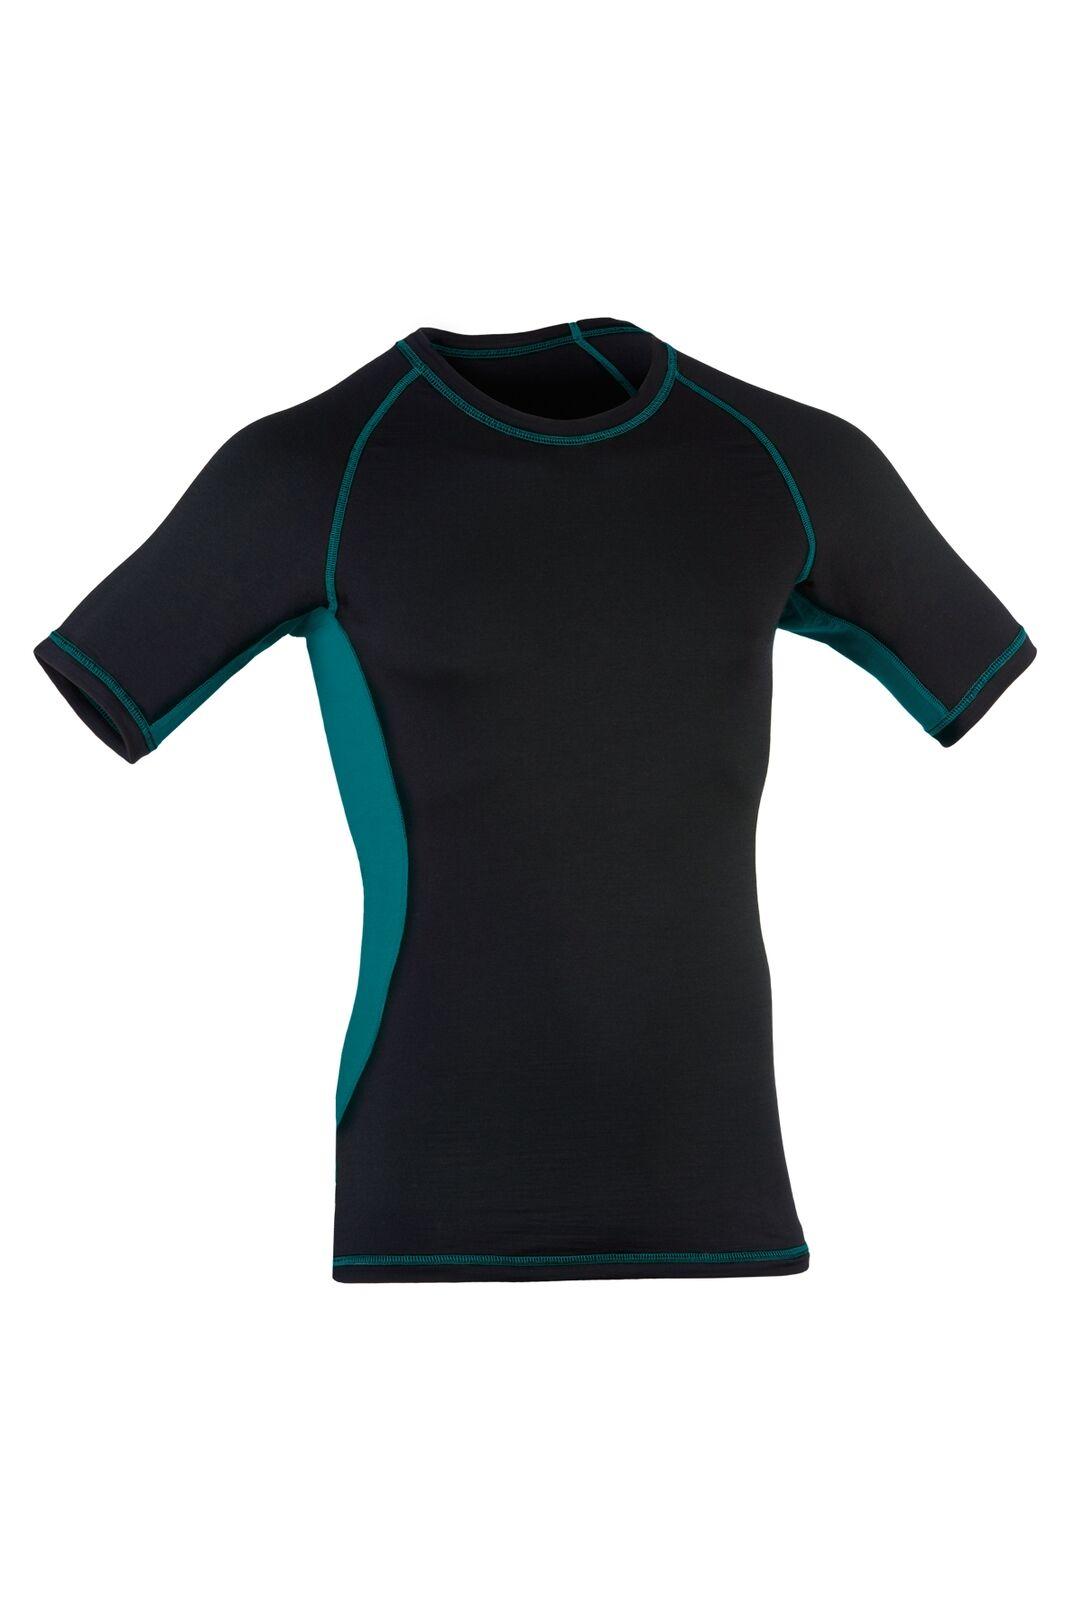 Engel Sports Herren Shirt ESM150202120 Funktionskleidung GOTS zertifiziert